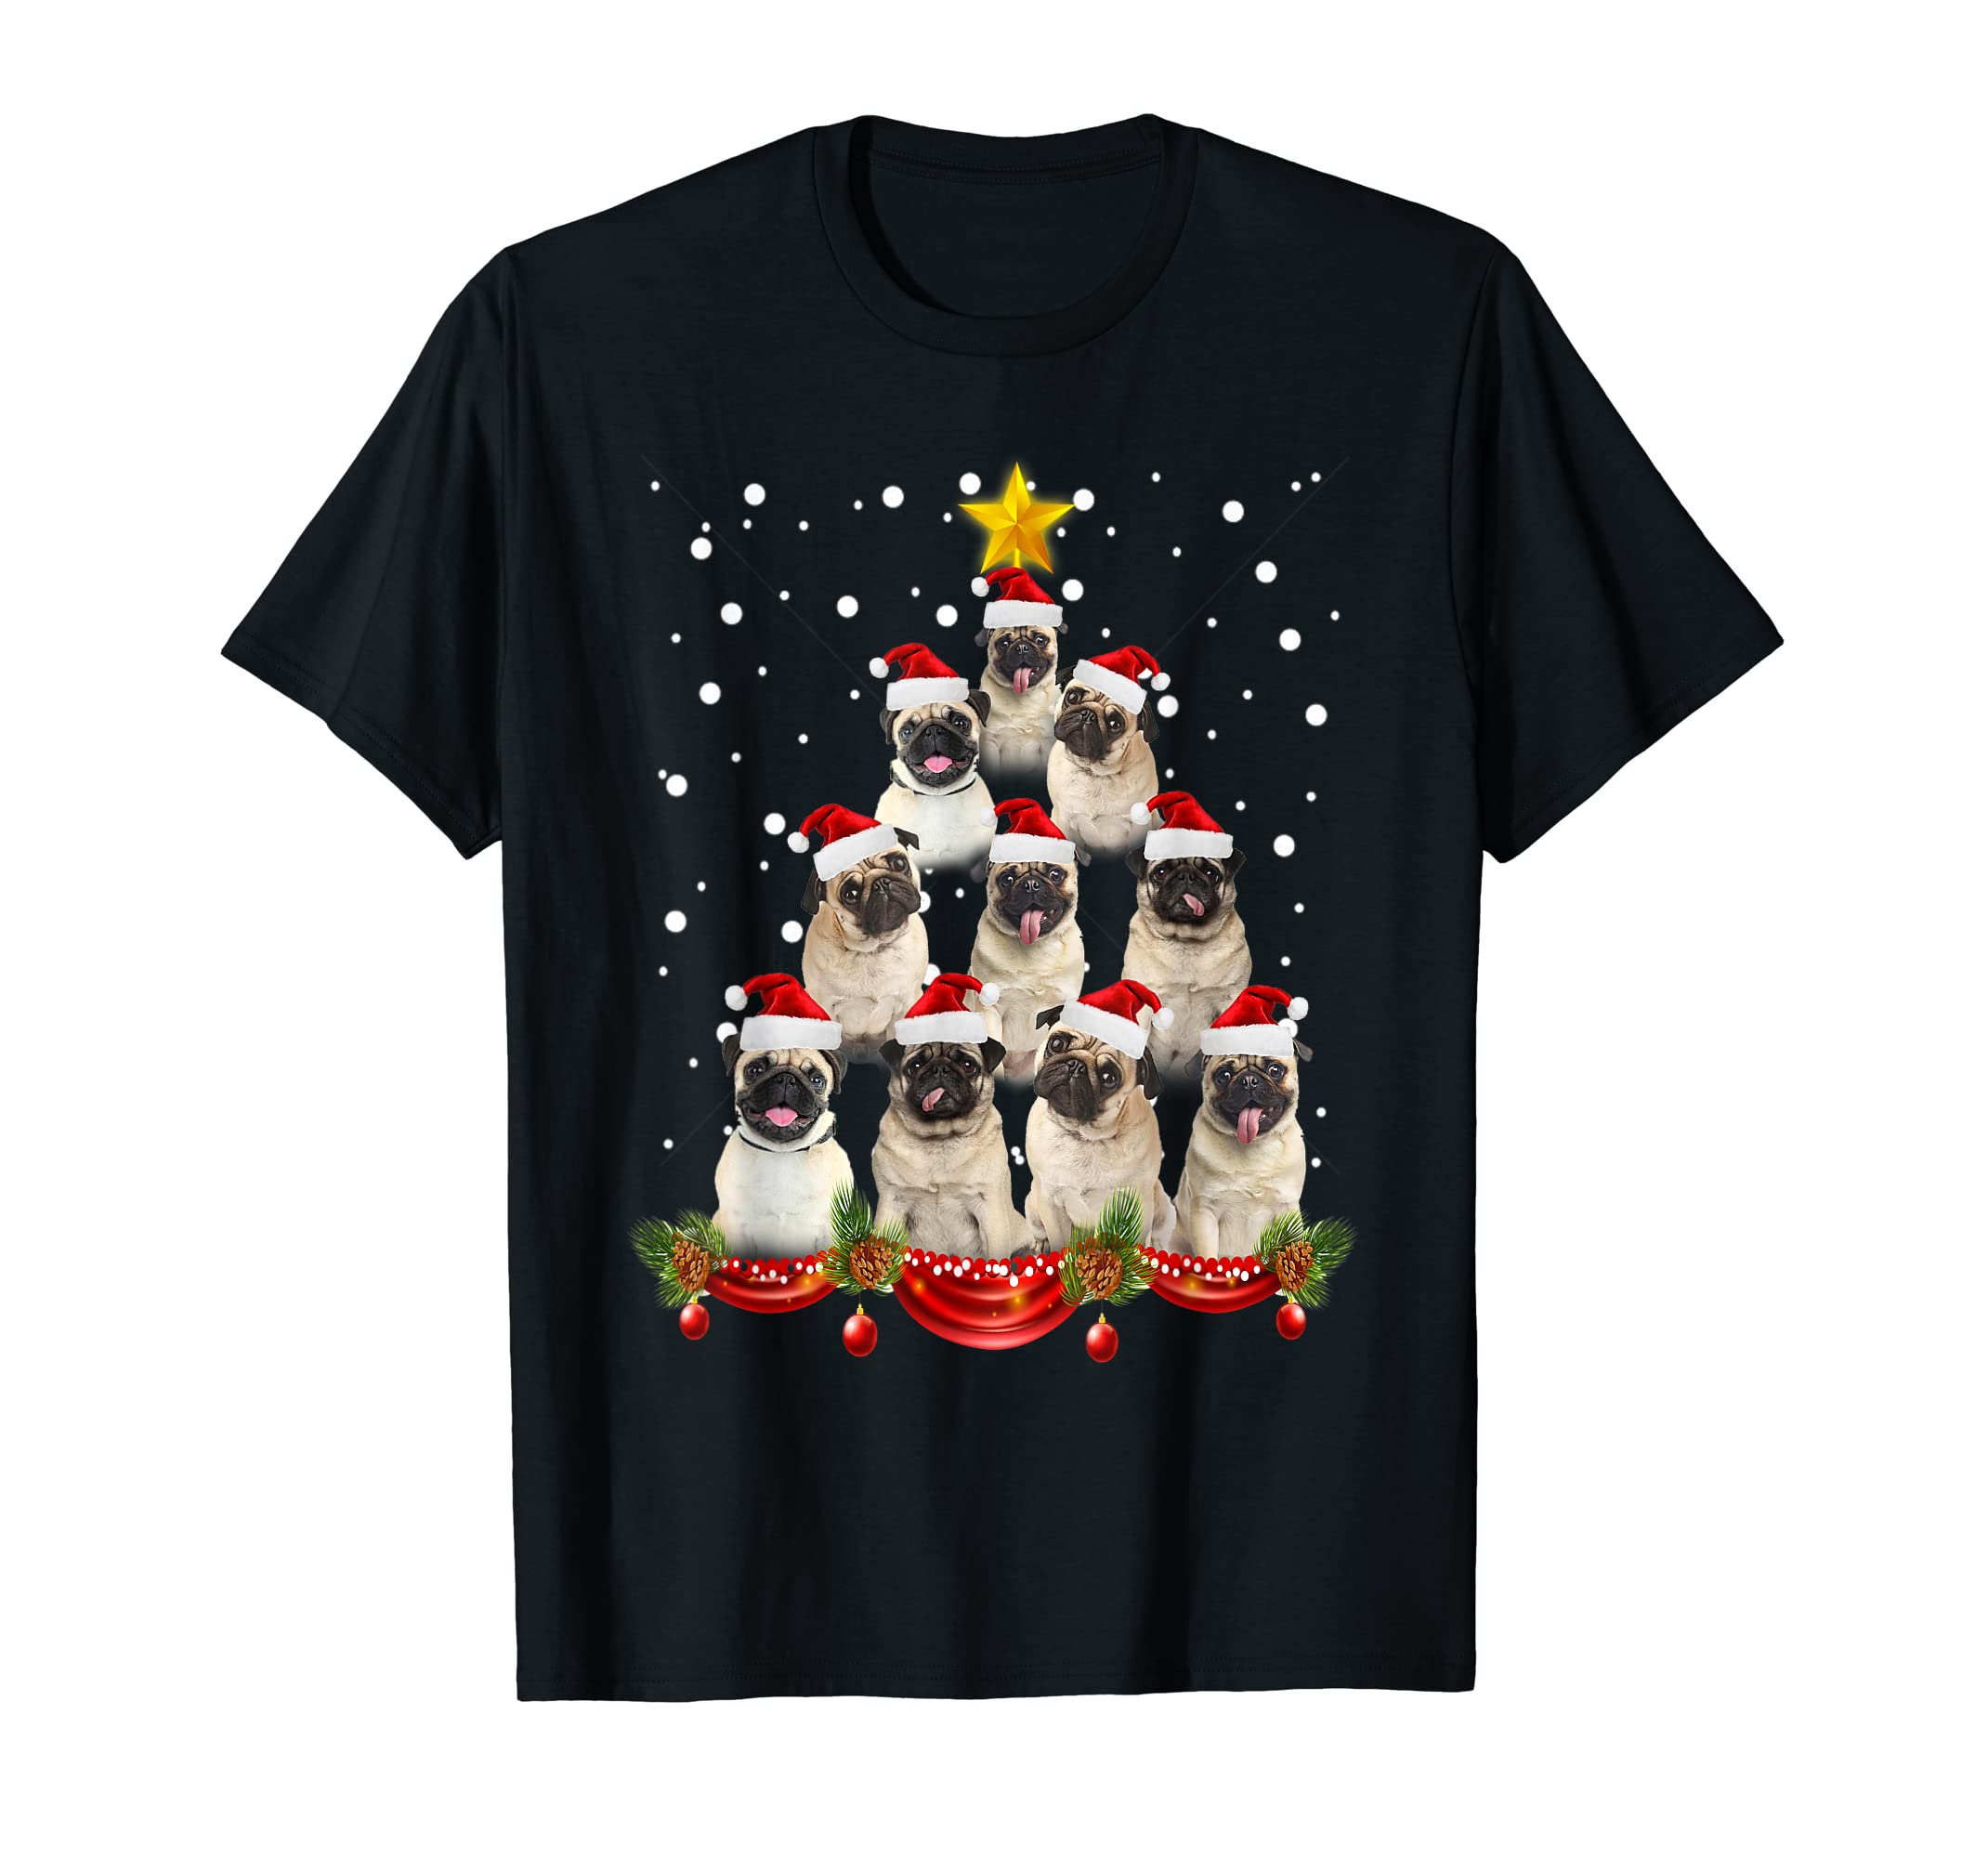 Pug Christmas Tree Costume Lovers Dog Gifts T-Shirt-Men's T-Shirt-Black